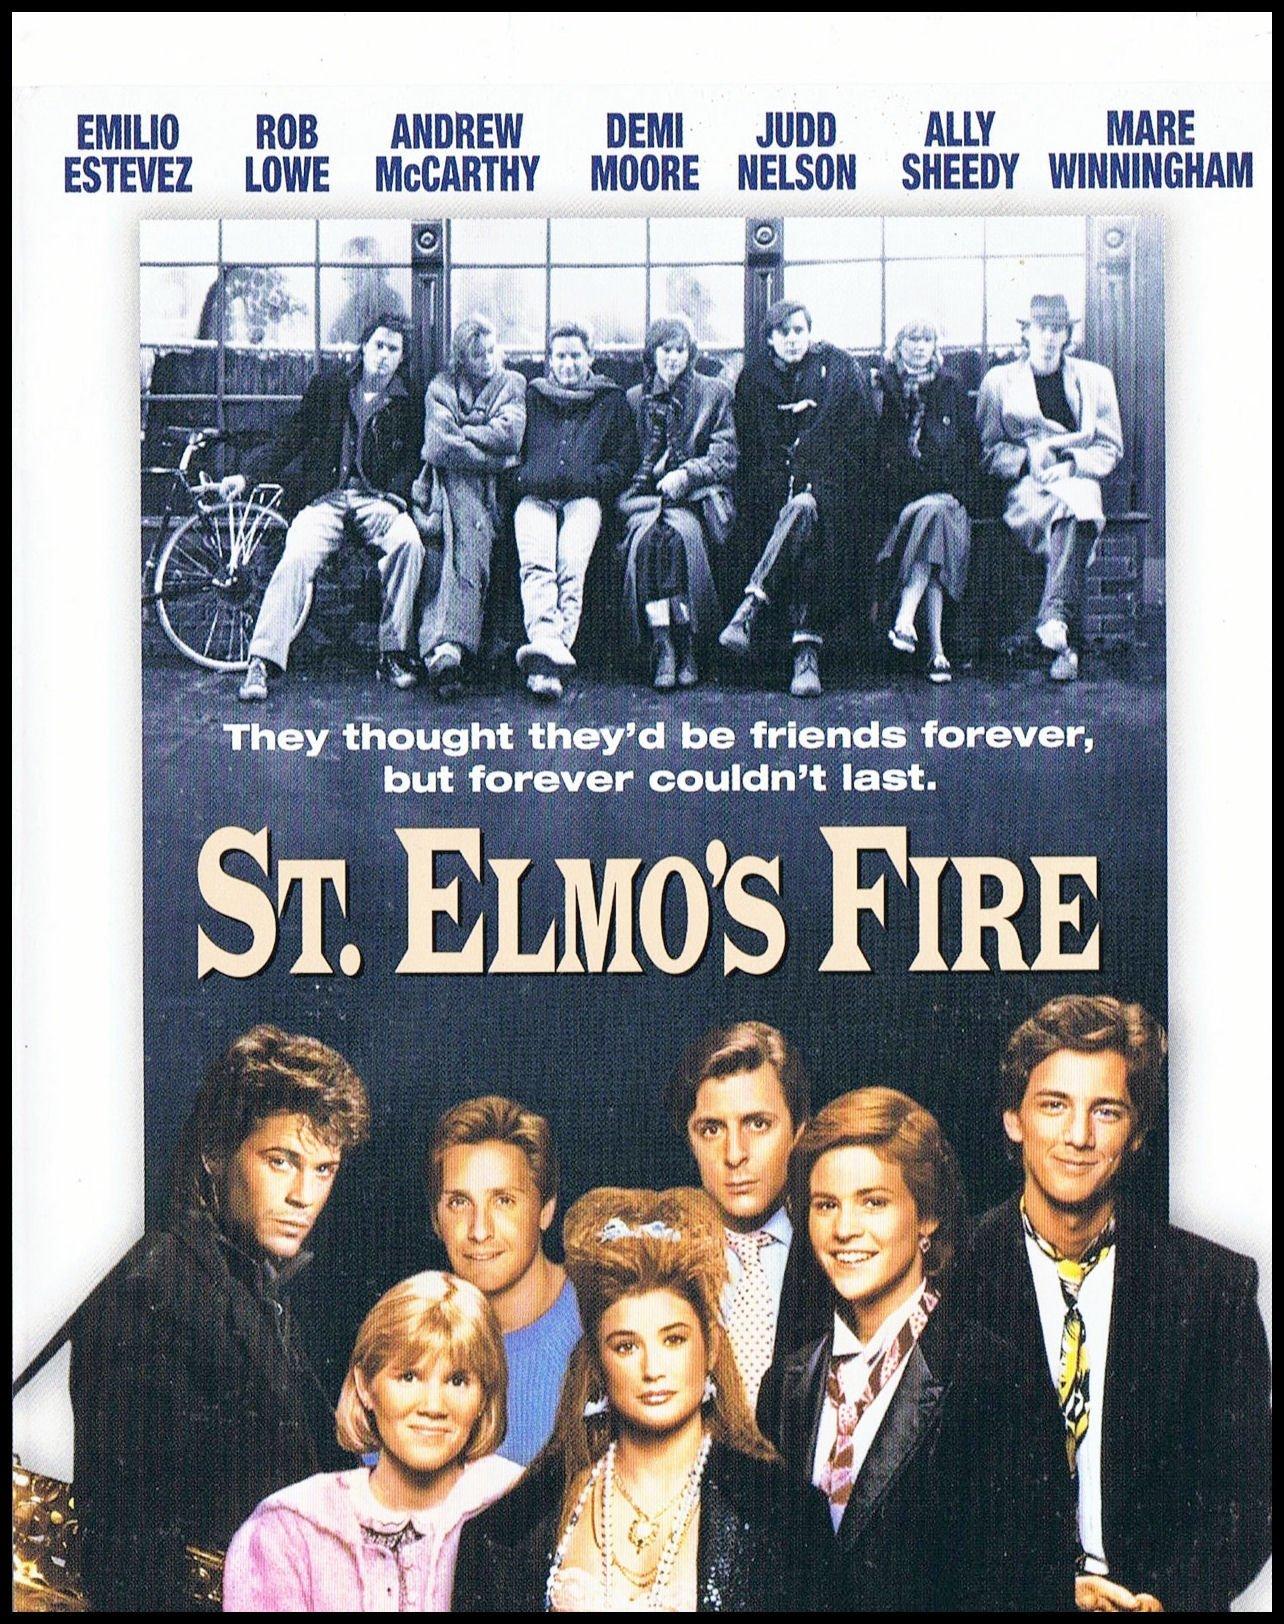 St Elmos Fire FRIDGE MAGNET Rob Lowe 6x8 Movie Poster Magnetic Canvas Print